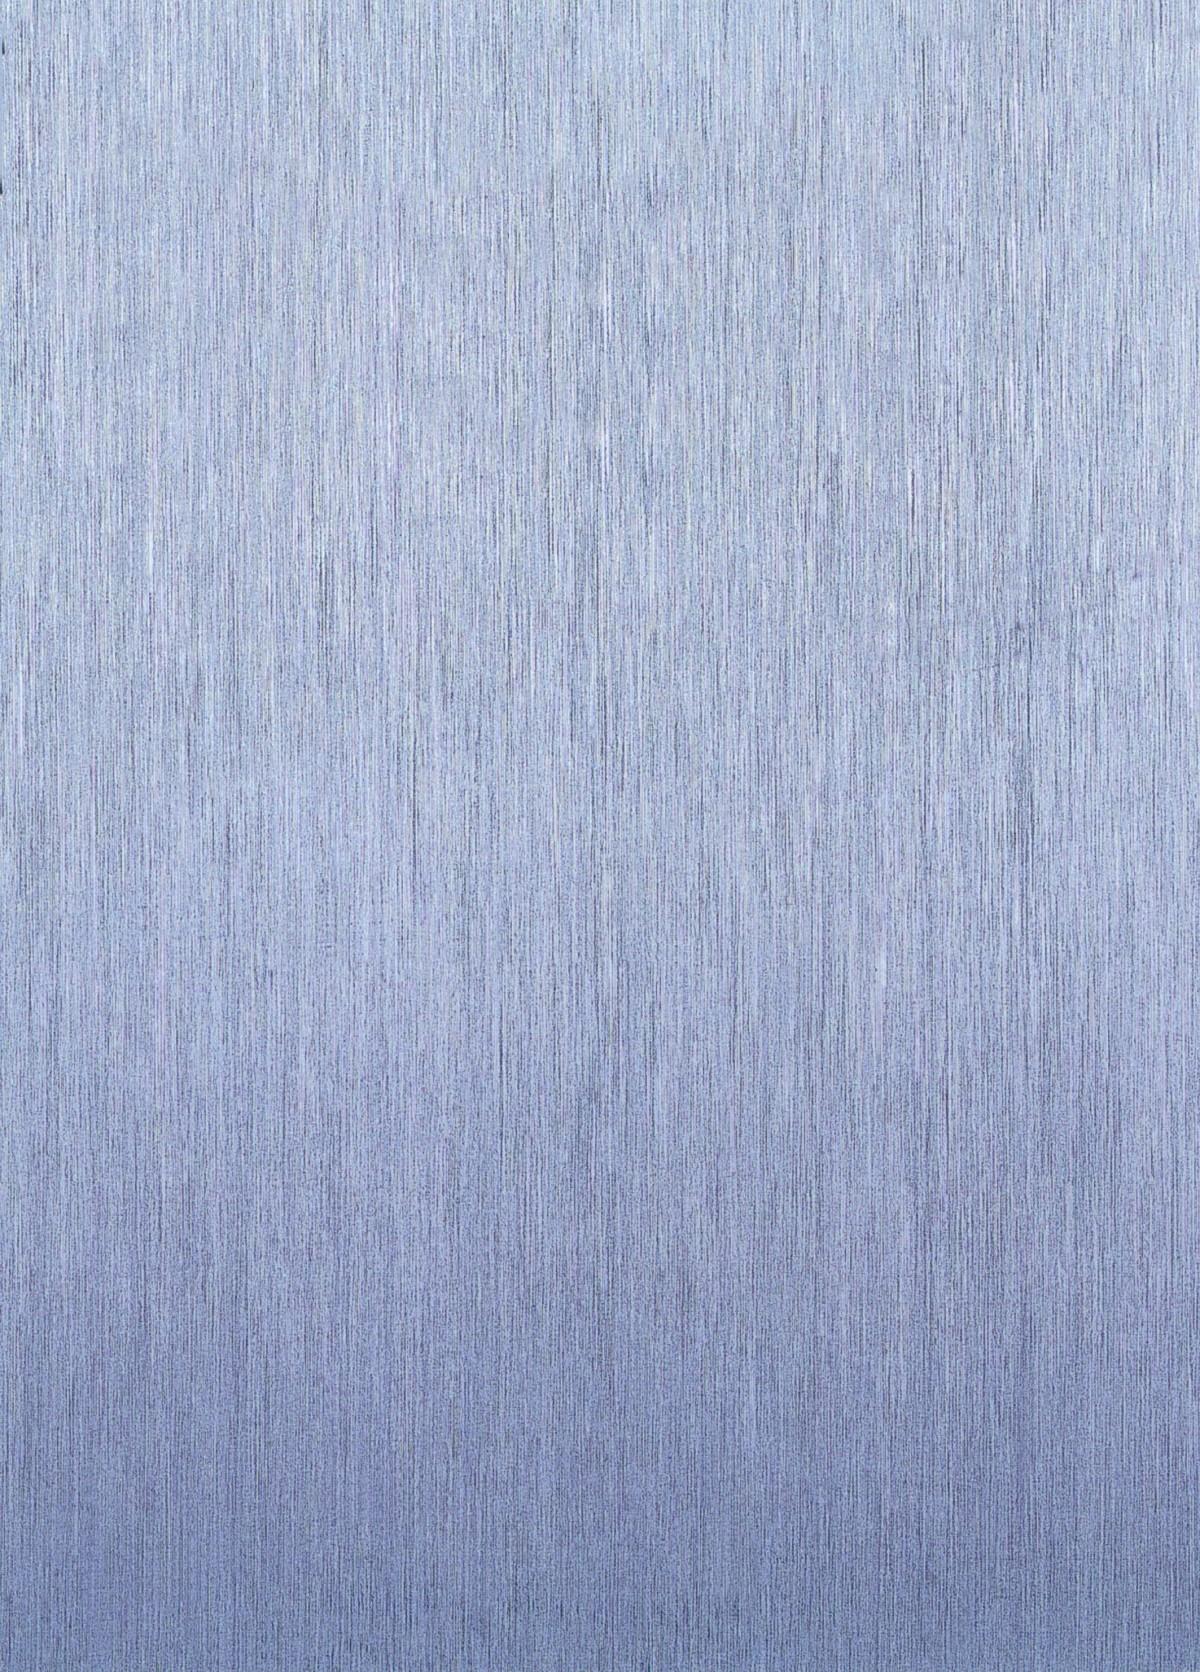 Free Images Wood Texture Floor Metal Blue Material